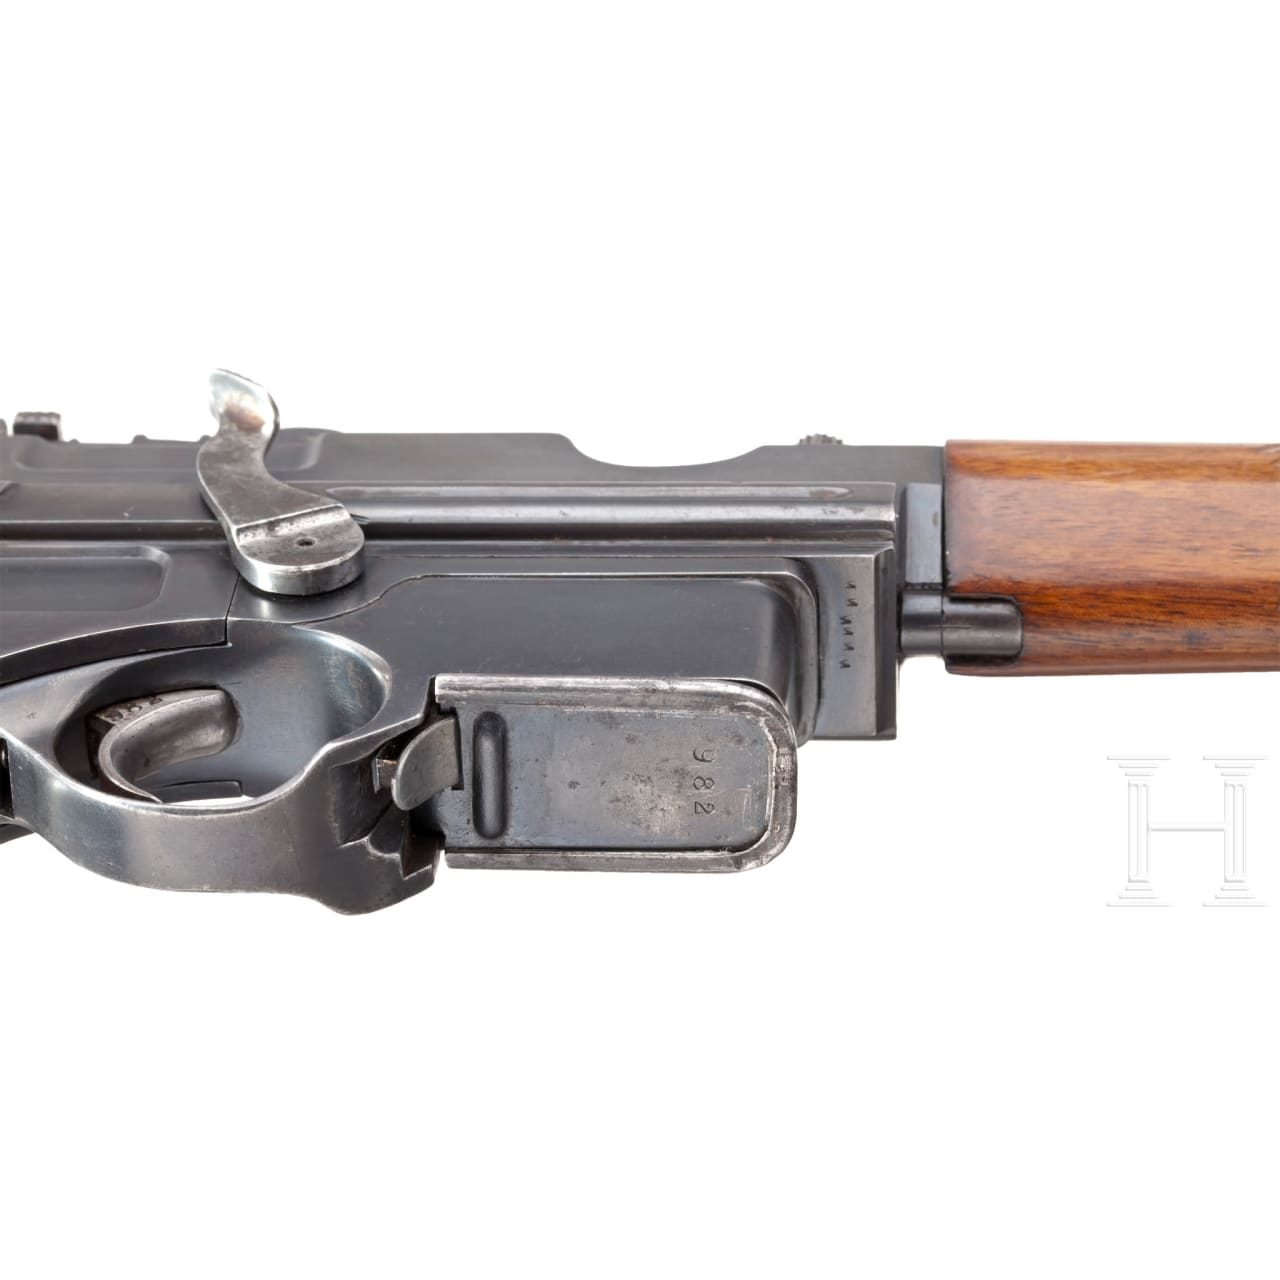 A Mannlicher self-loading pistol carbine mod. 1901